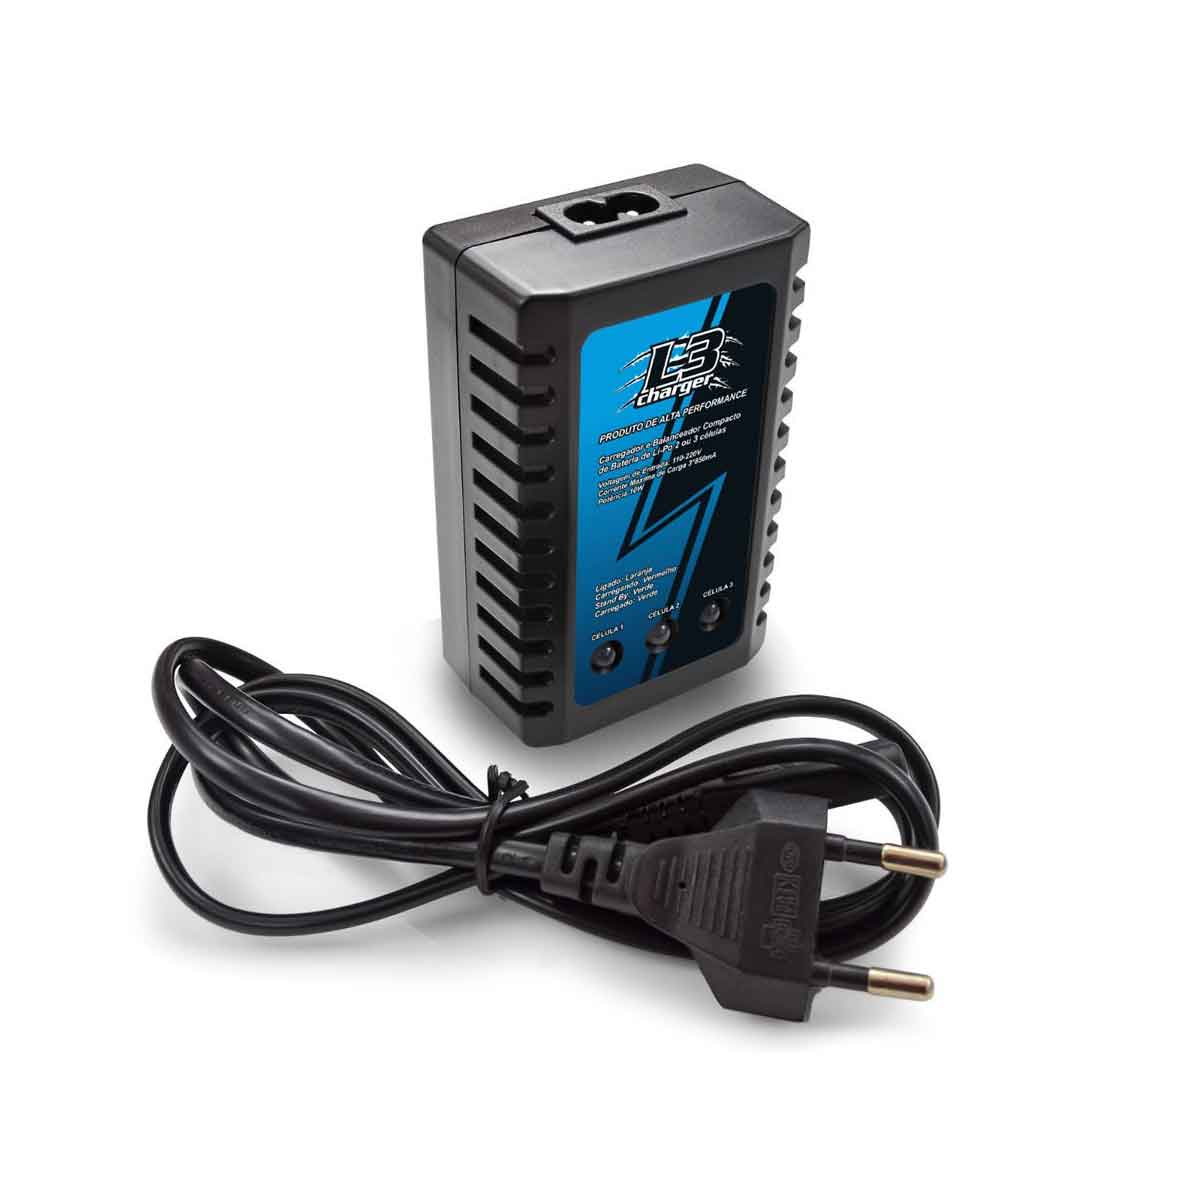 Carregador Balanc P/ Bater Áe?o Model Li-Po 2/3 Cél 110/220V